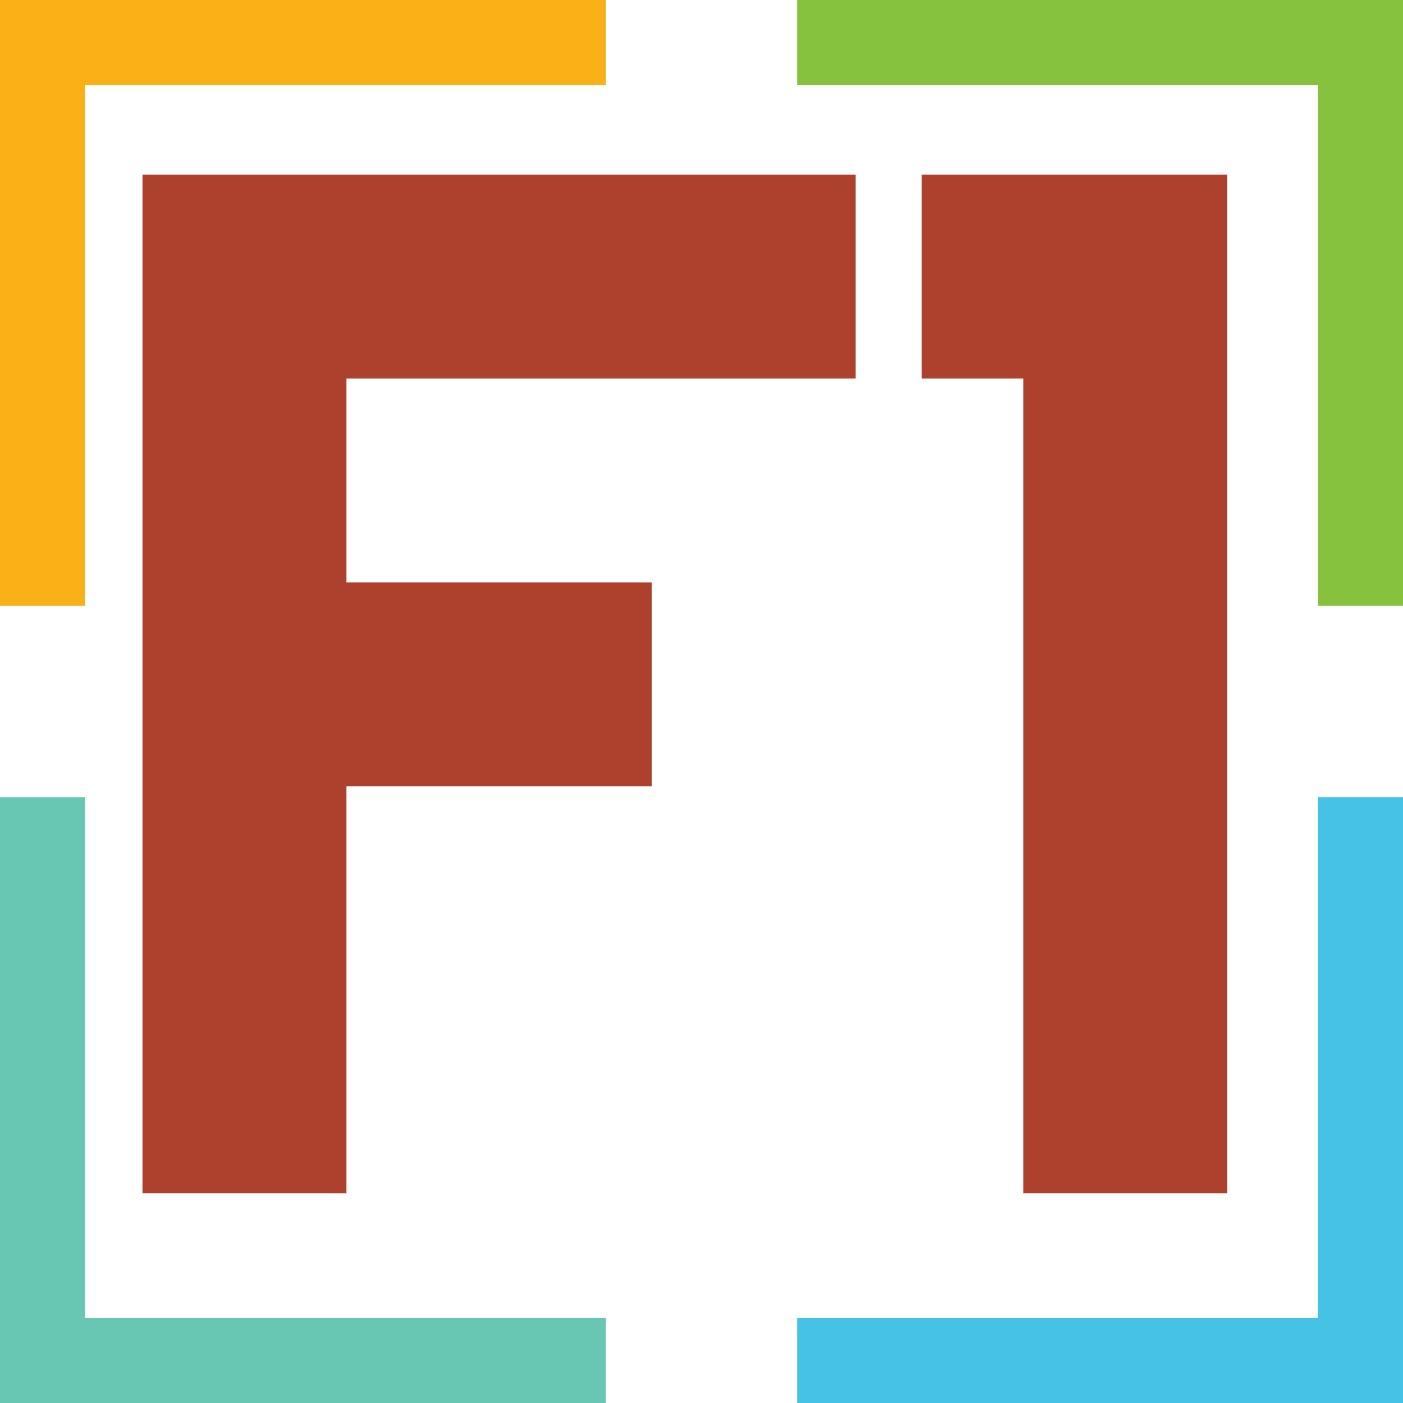 F1 Fingerprinting - Kitchener - 871 Victoria St N, Unit 210, Kitchener, ON